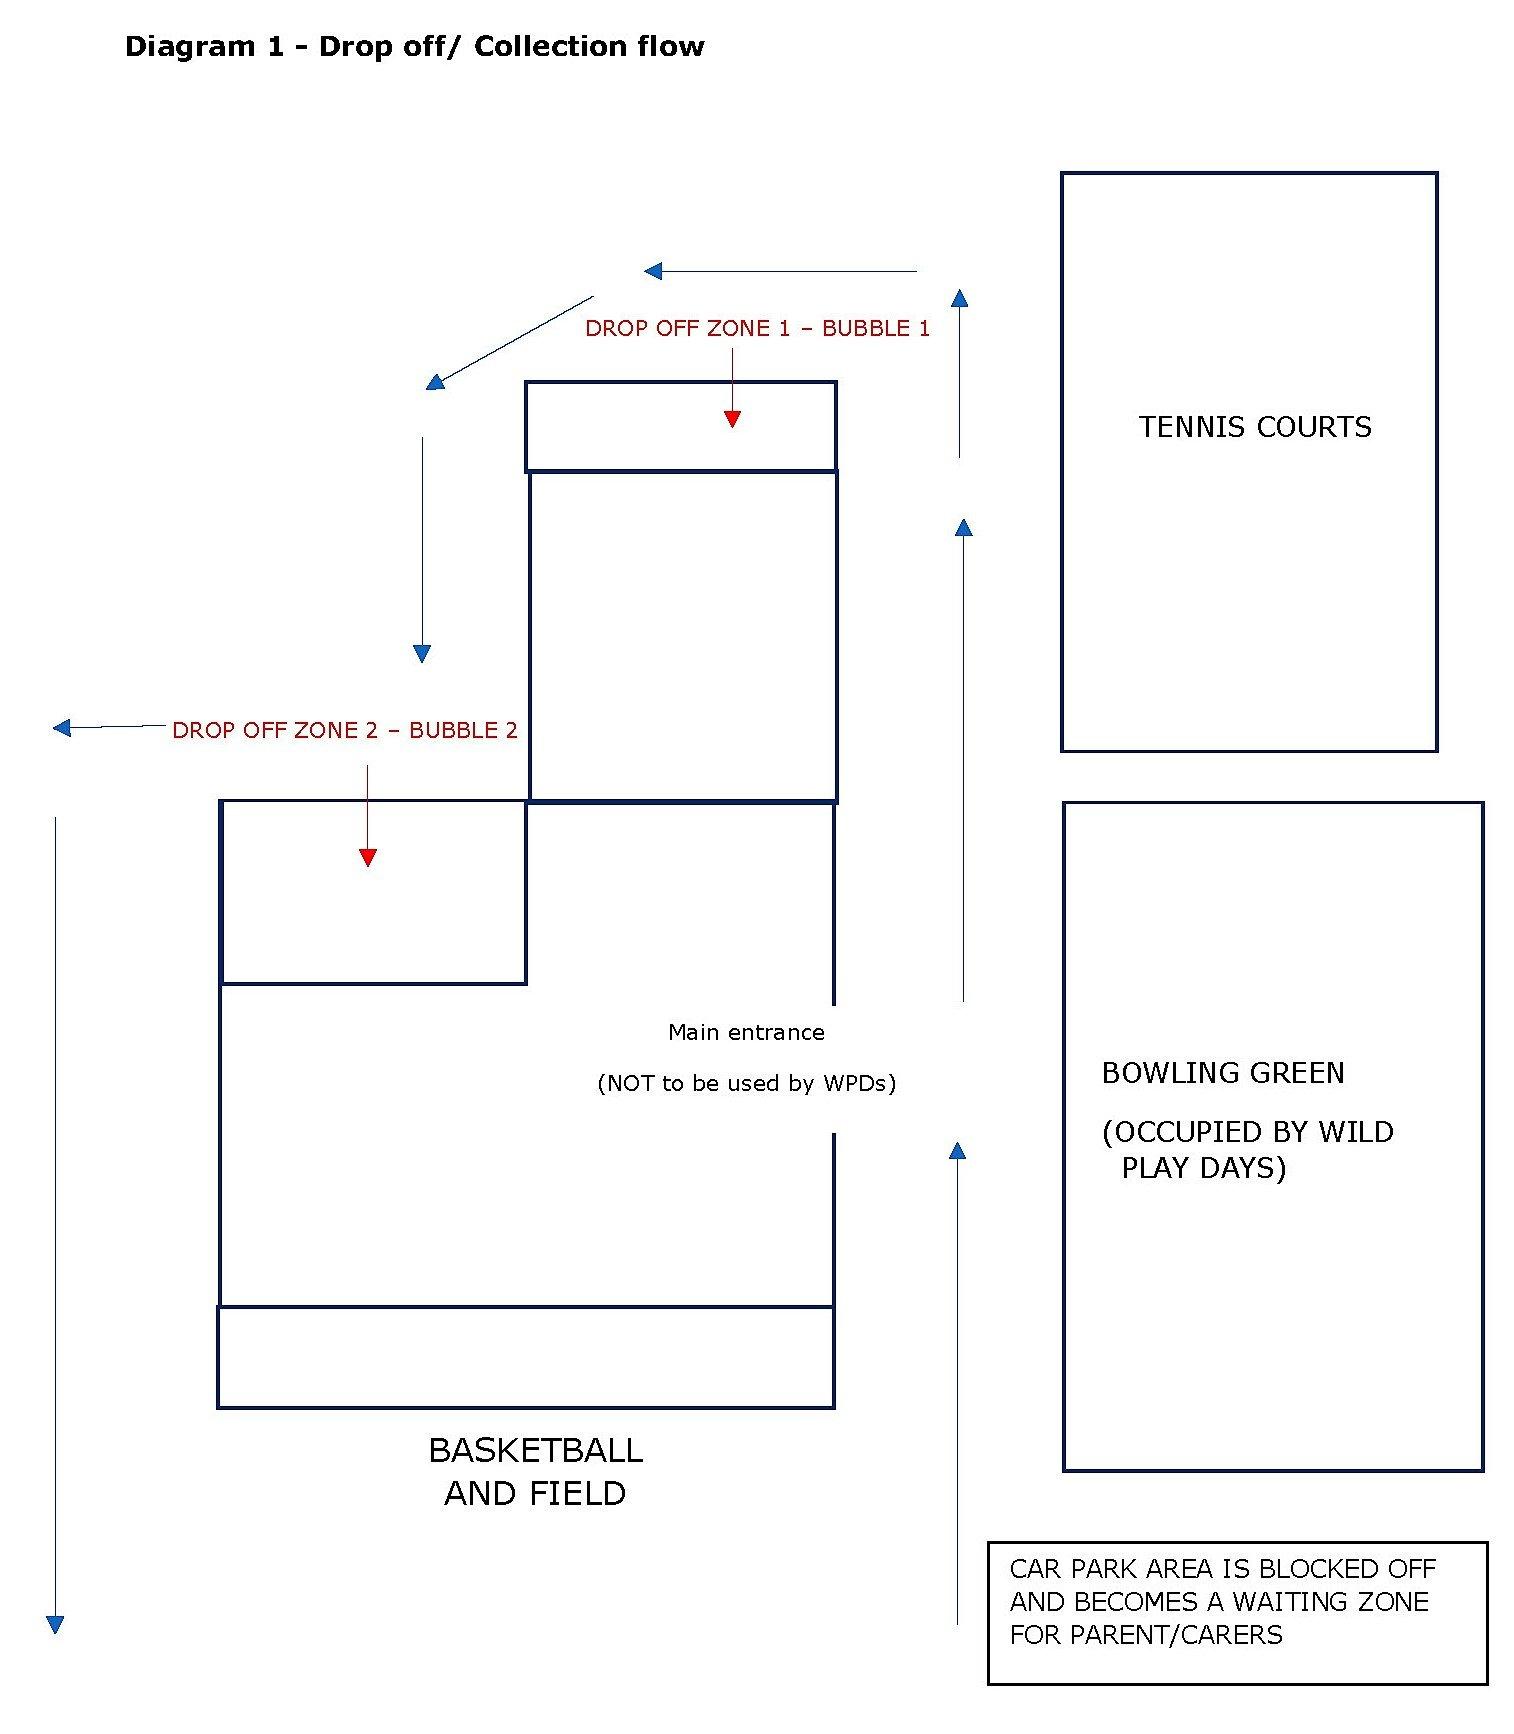 Diagram 1 WPD - Wild Play Days